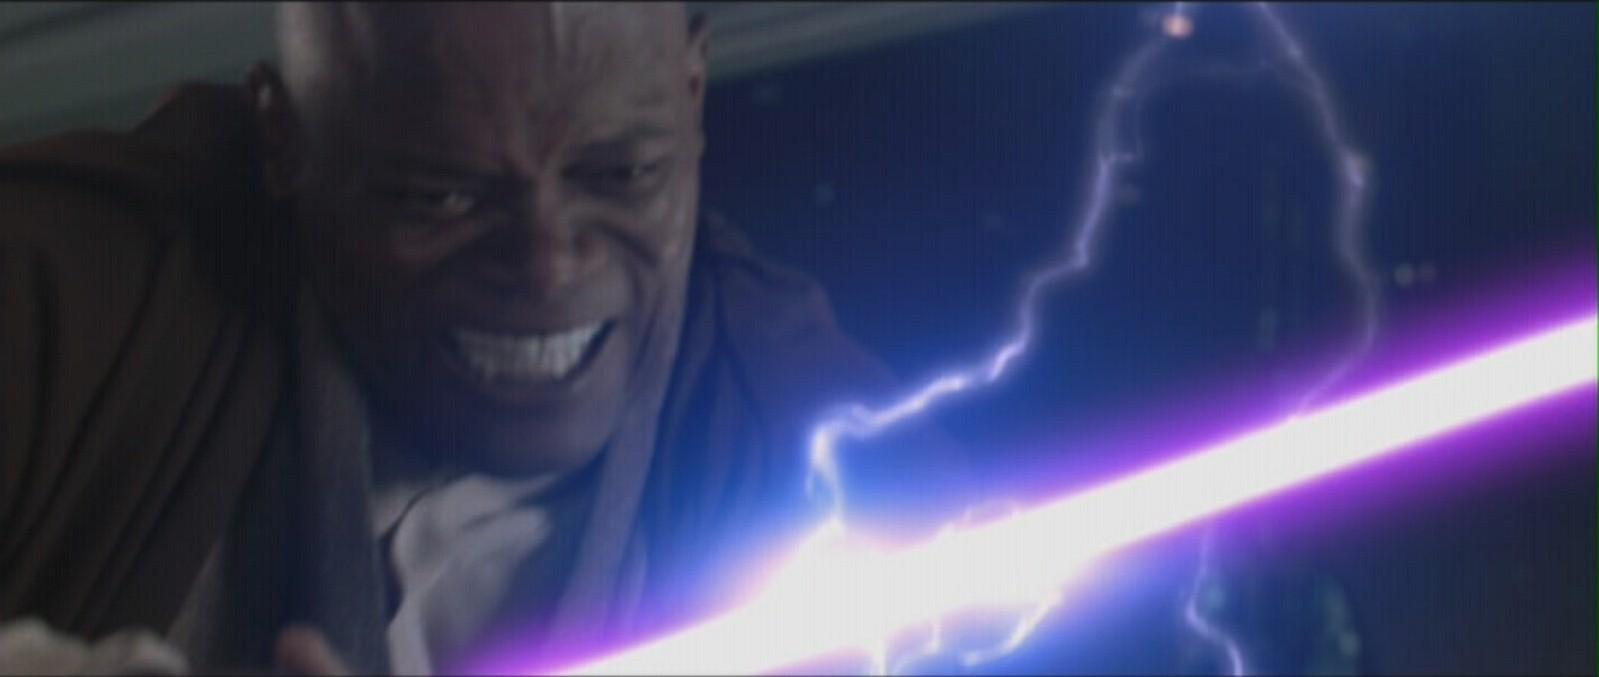 Etoile Star Wars Revenge Of The Sith Mace Windu Image 12231278 Fanpop